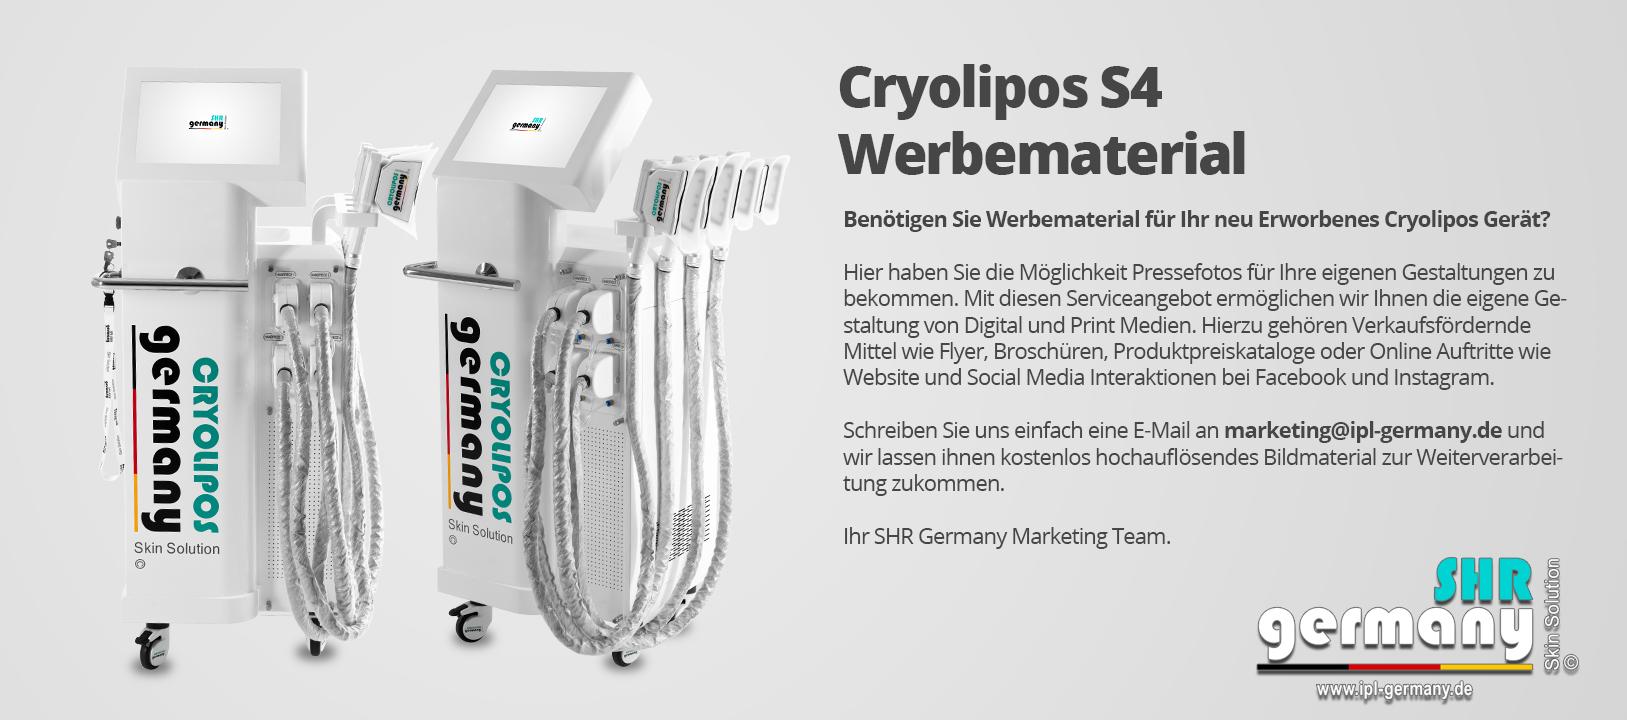 SHR-Germany_Cryolipos_S4_Werbematerial